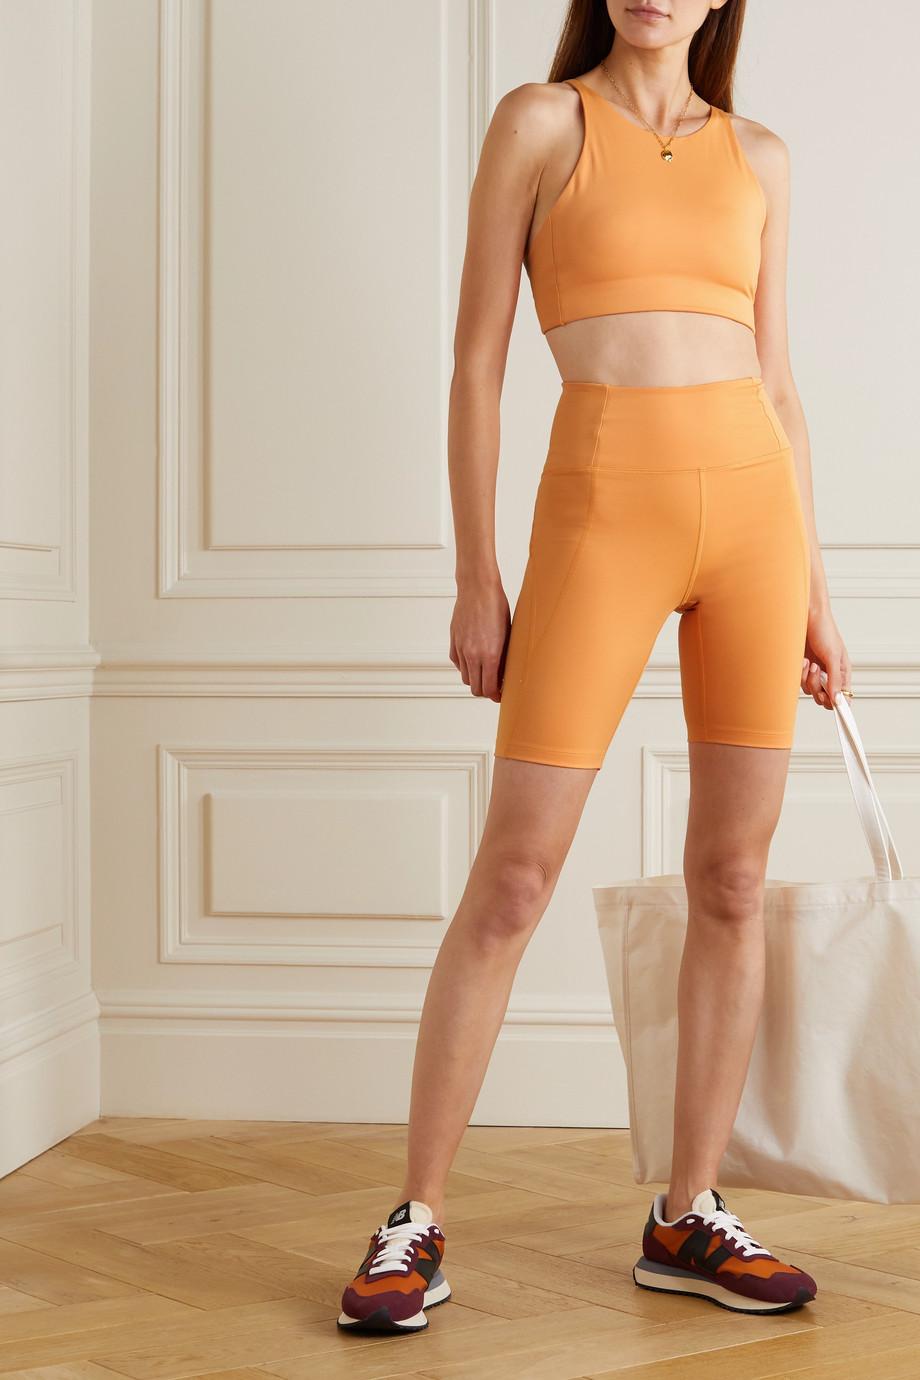 Girlfriend Collective + NET SUSTAIN Topanga recycled stretch sports bra